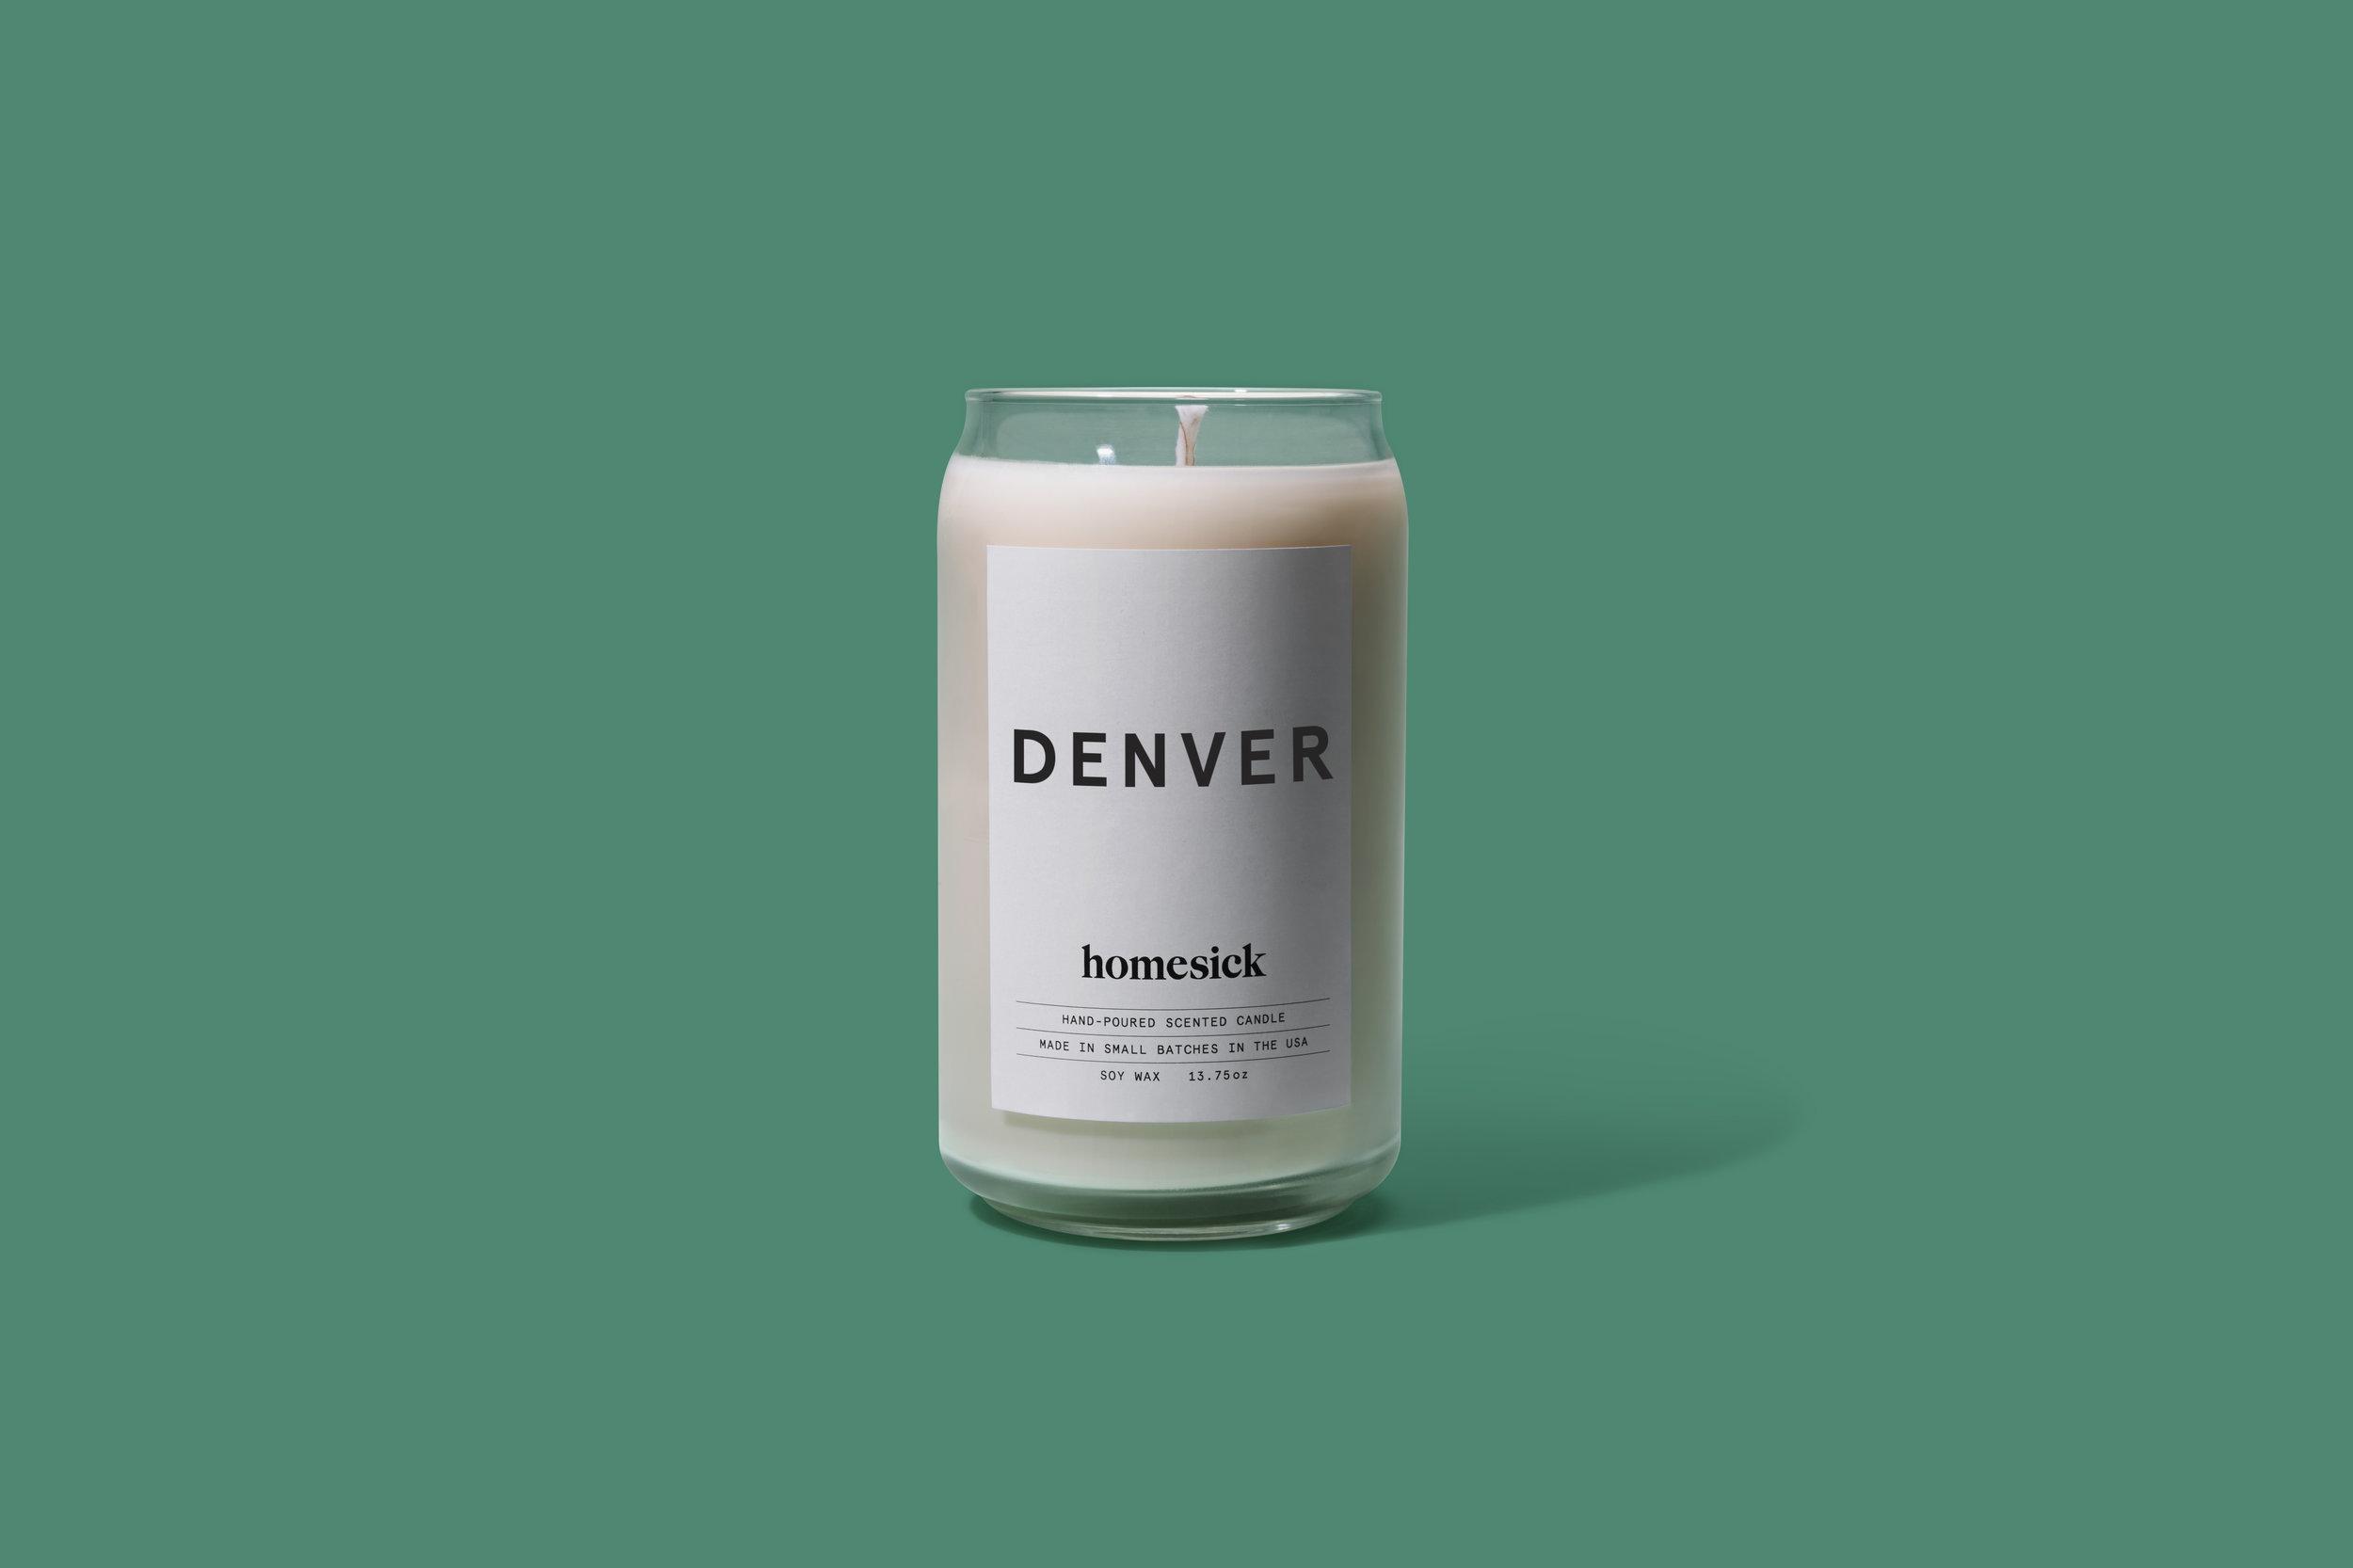 homesick-candle-OW-denver.jpg